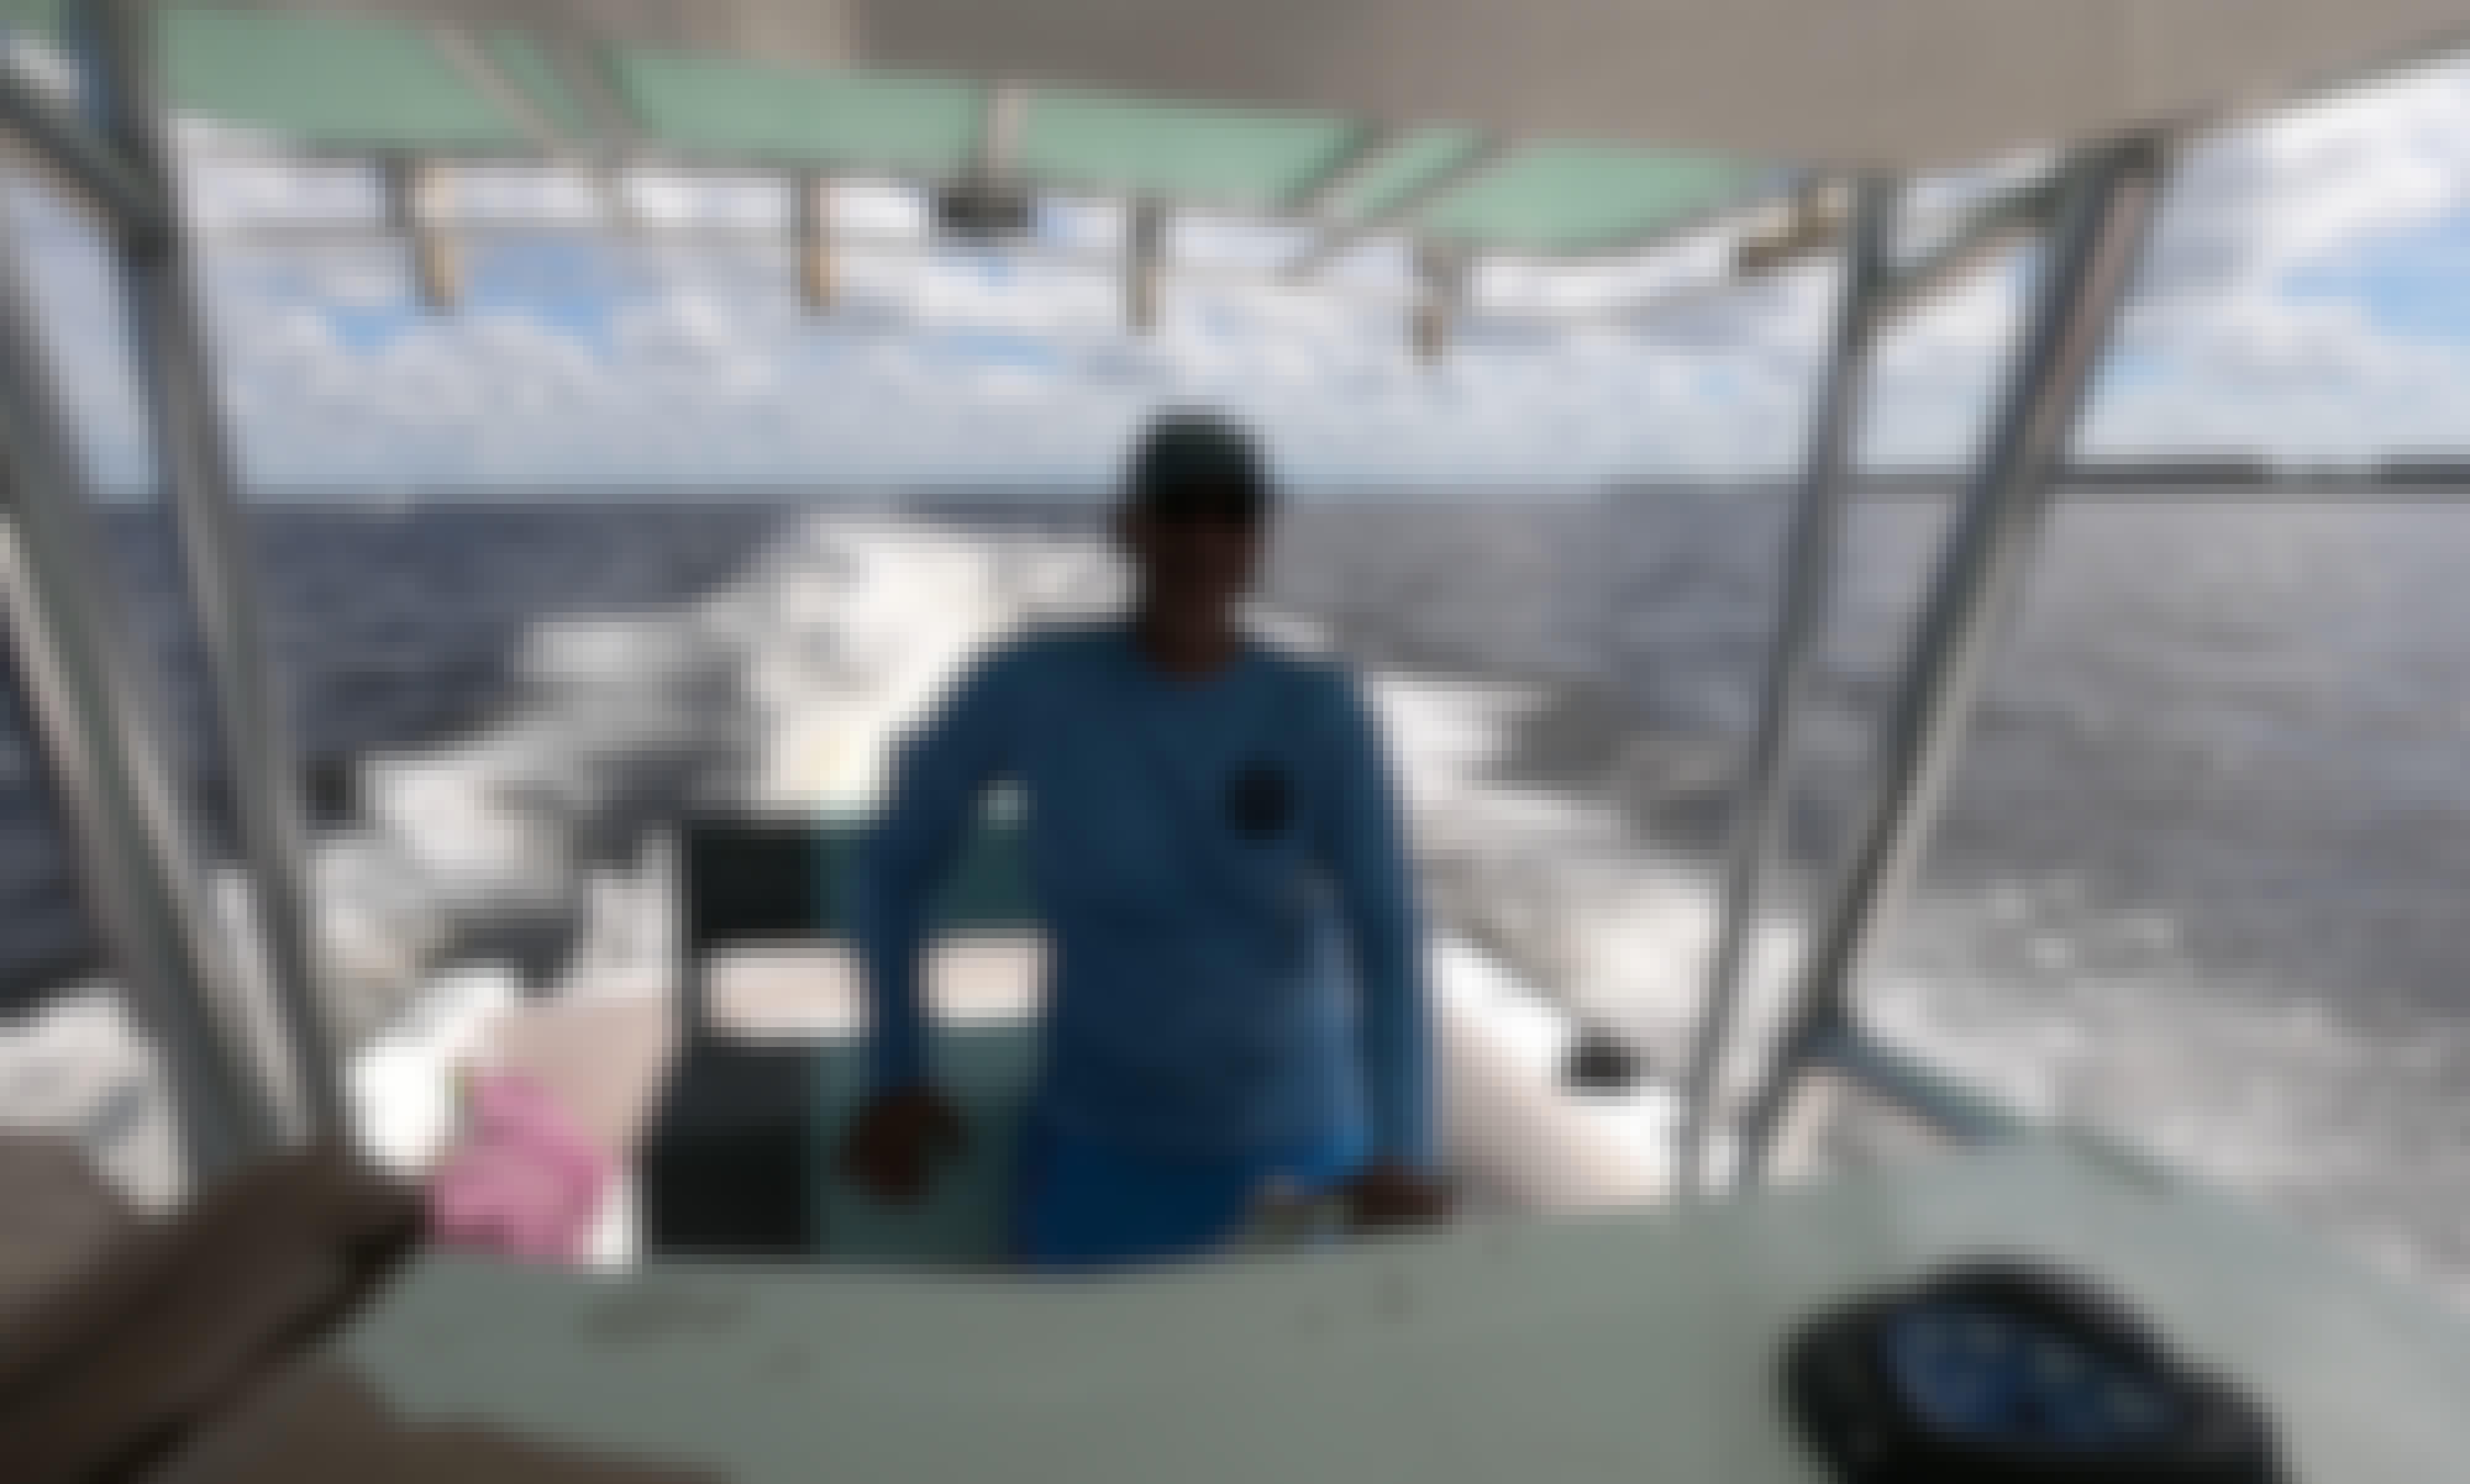 26' Calcutta Catamaran for Fishing, Cruising, and Eco Tours in Venice Florida